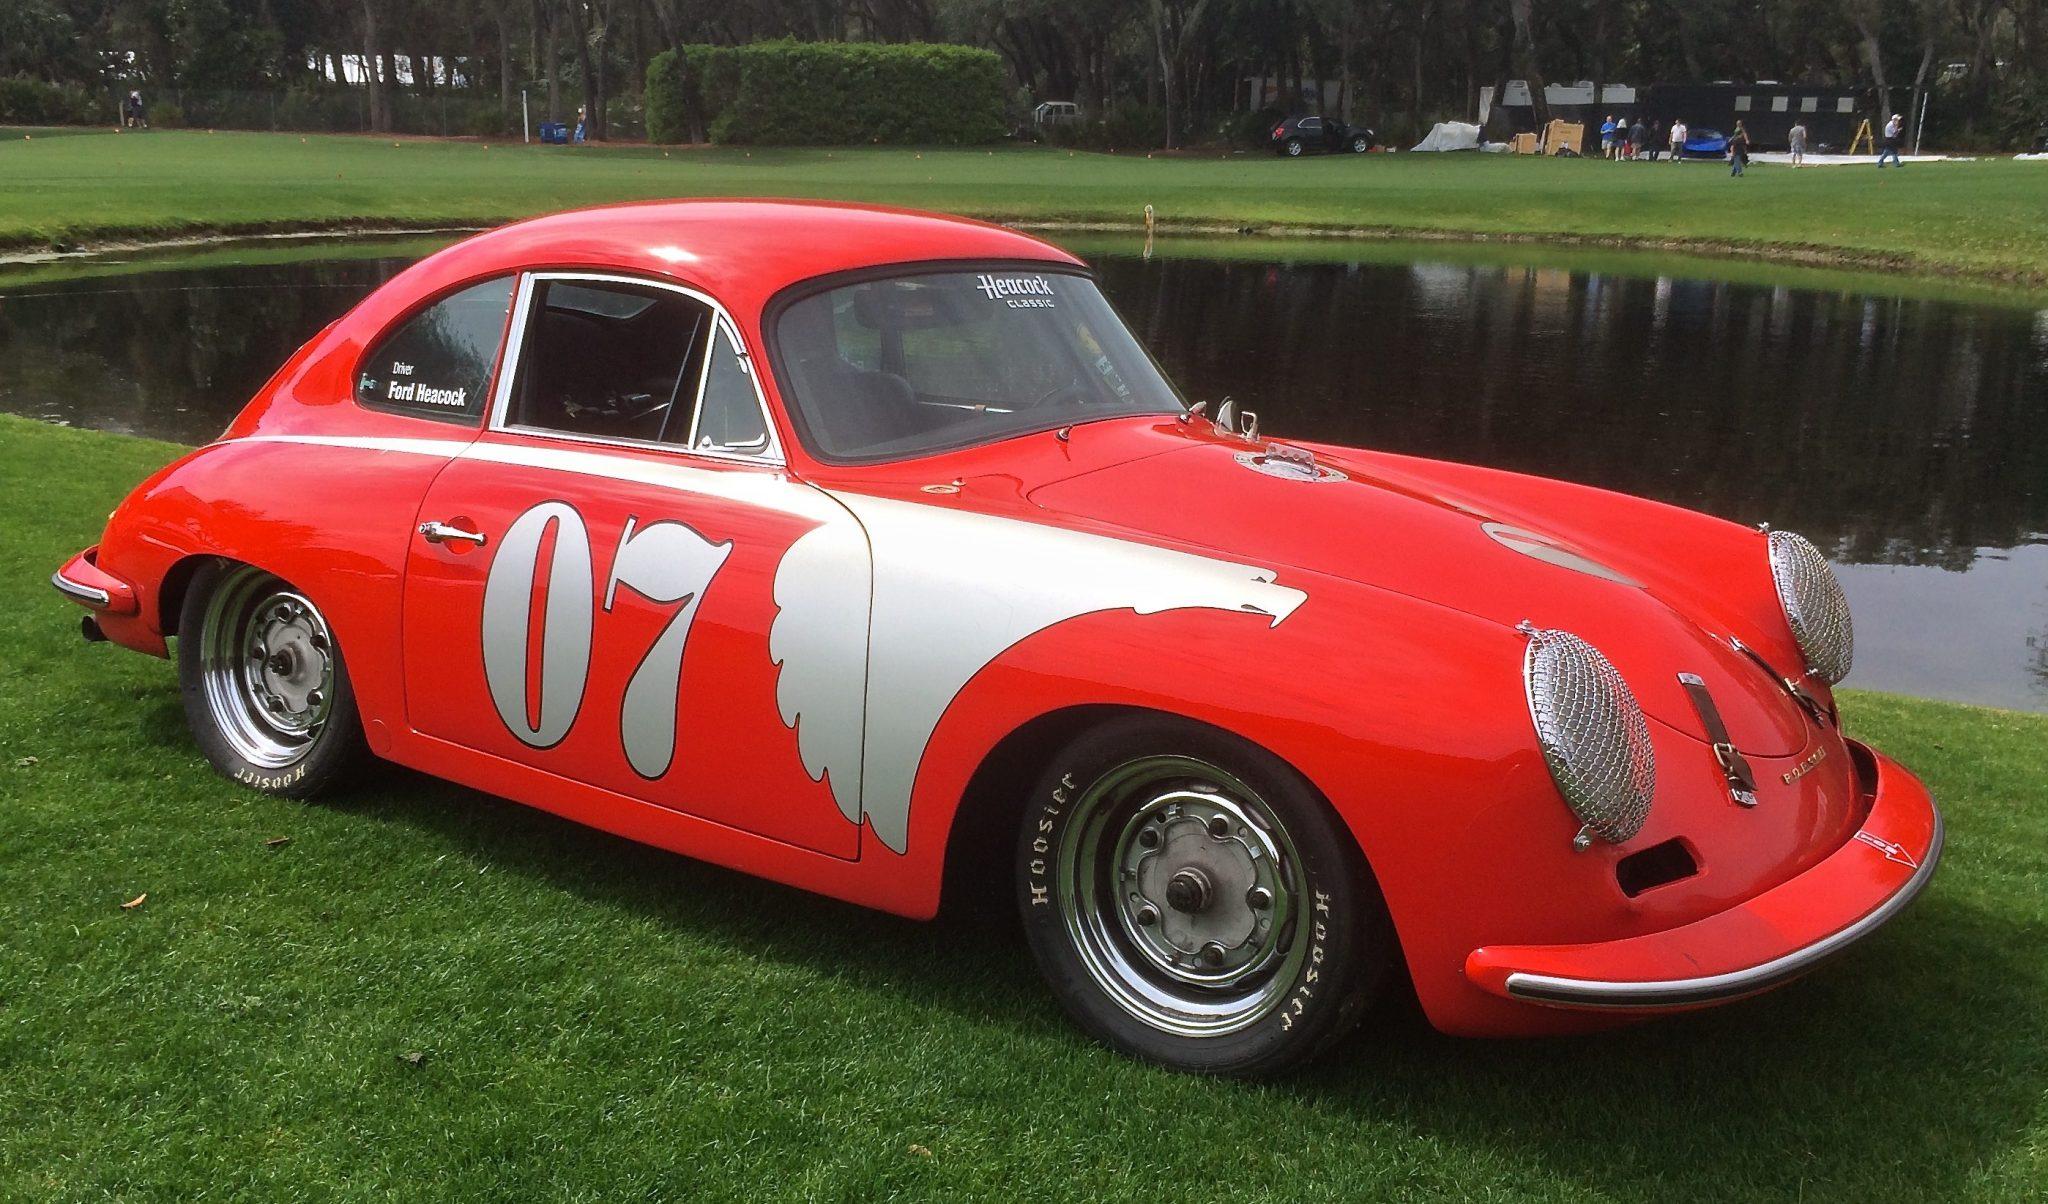 Classic Porsche race car at a show